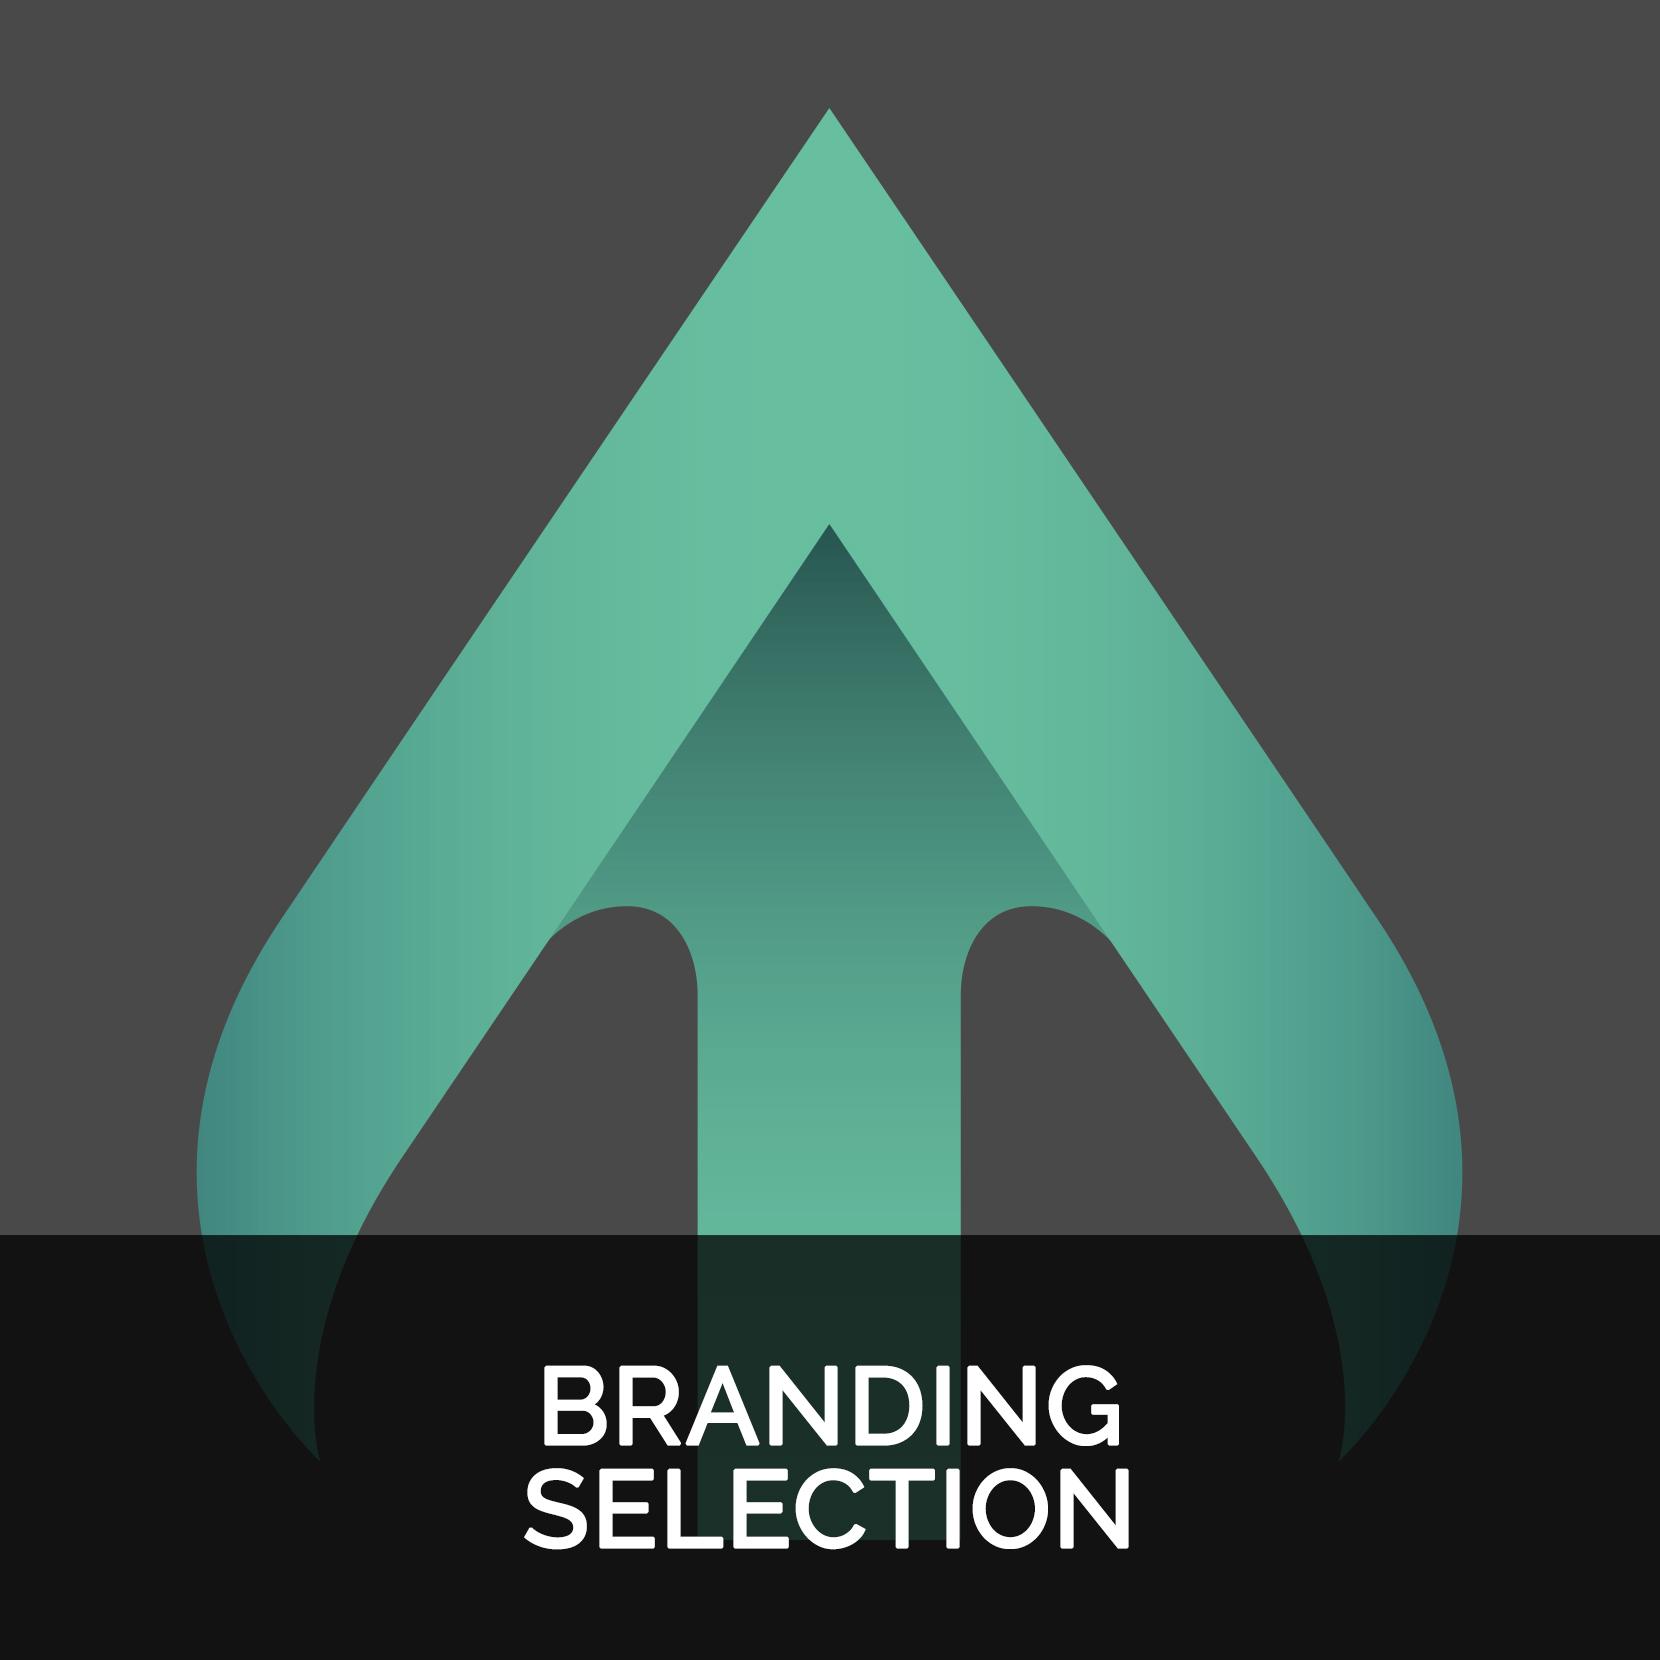 https://rusyndesign.co.uk/wp-content/uploads/2015/04/Work-square-Branding.jpg